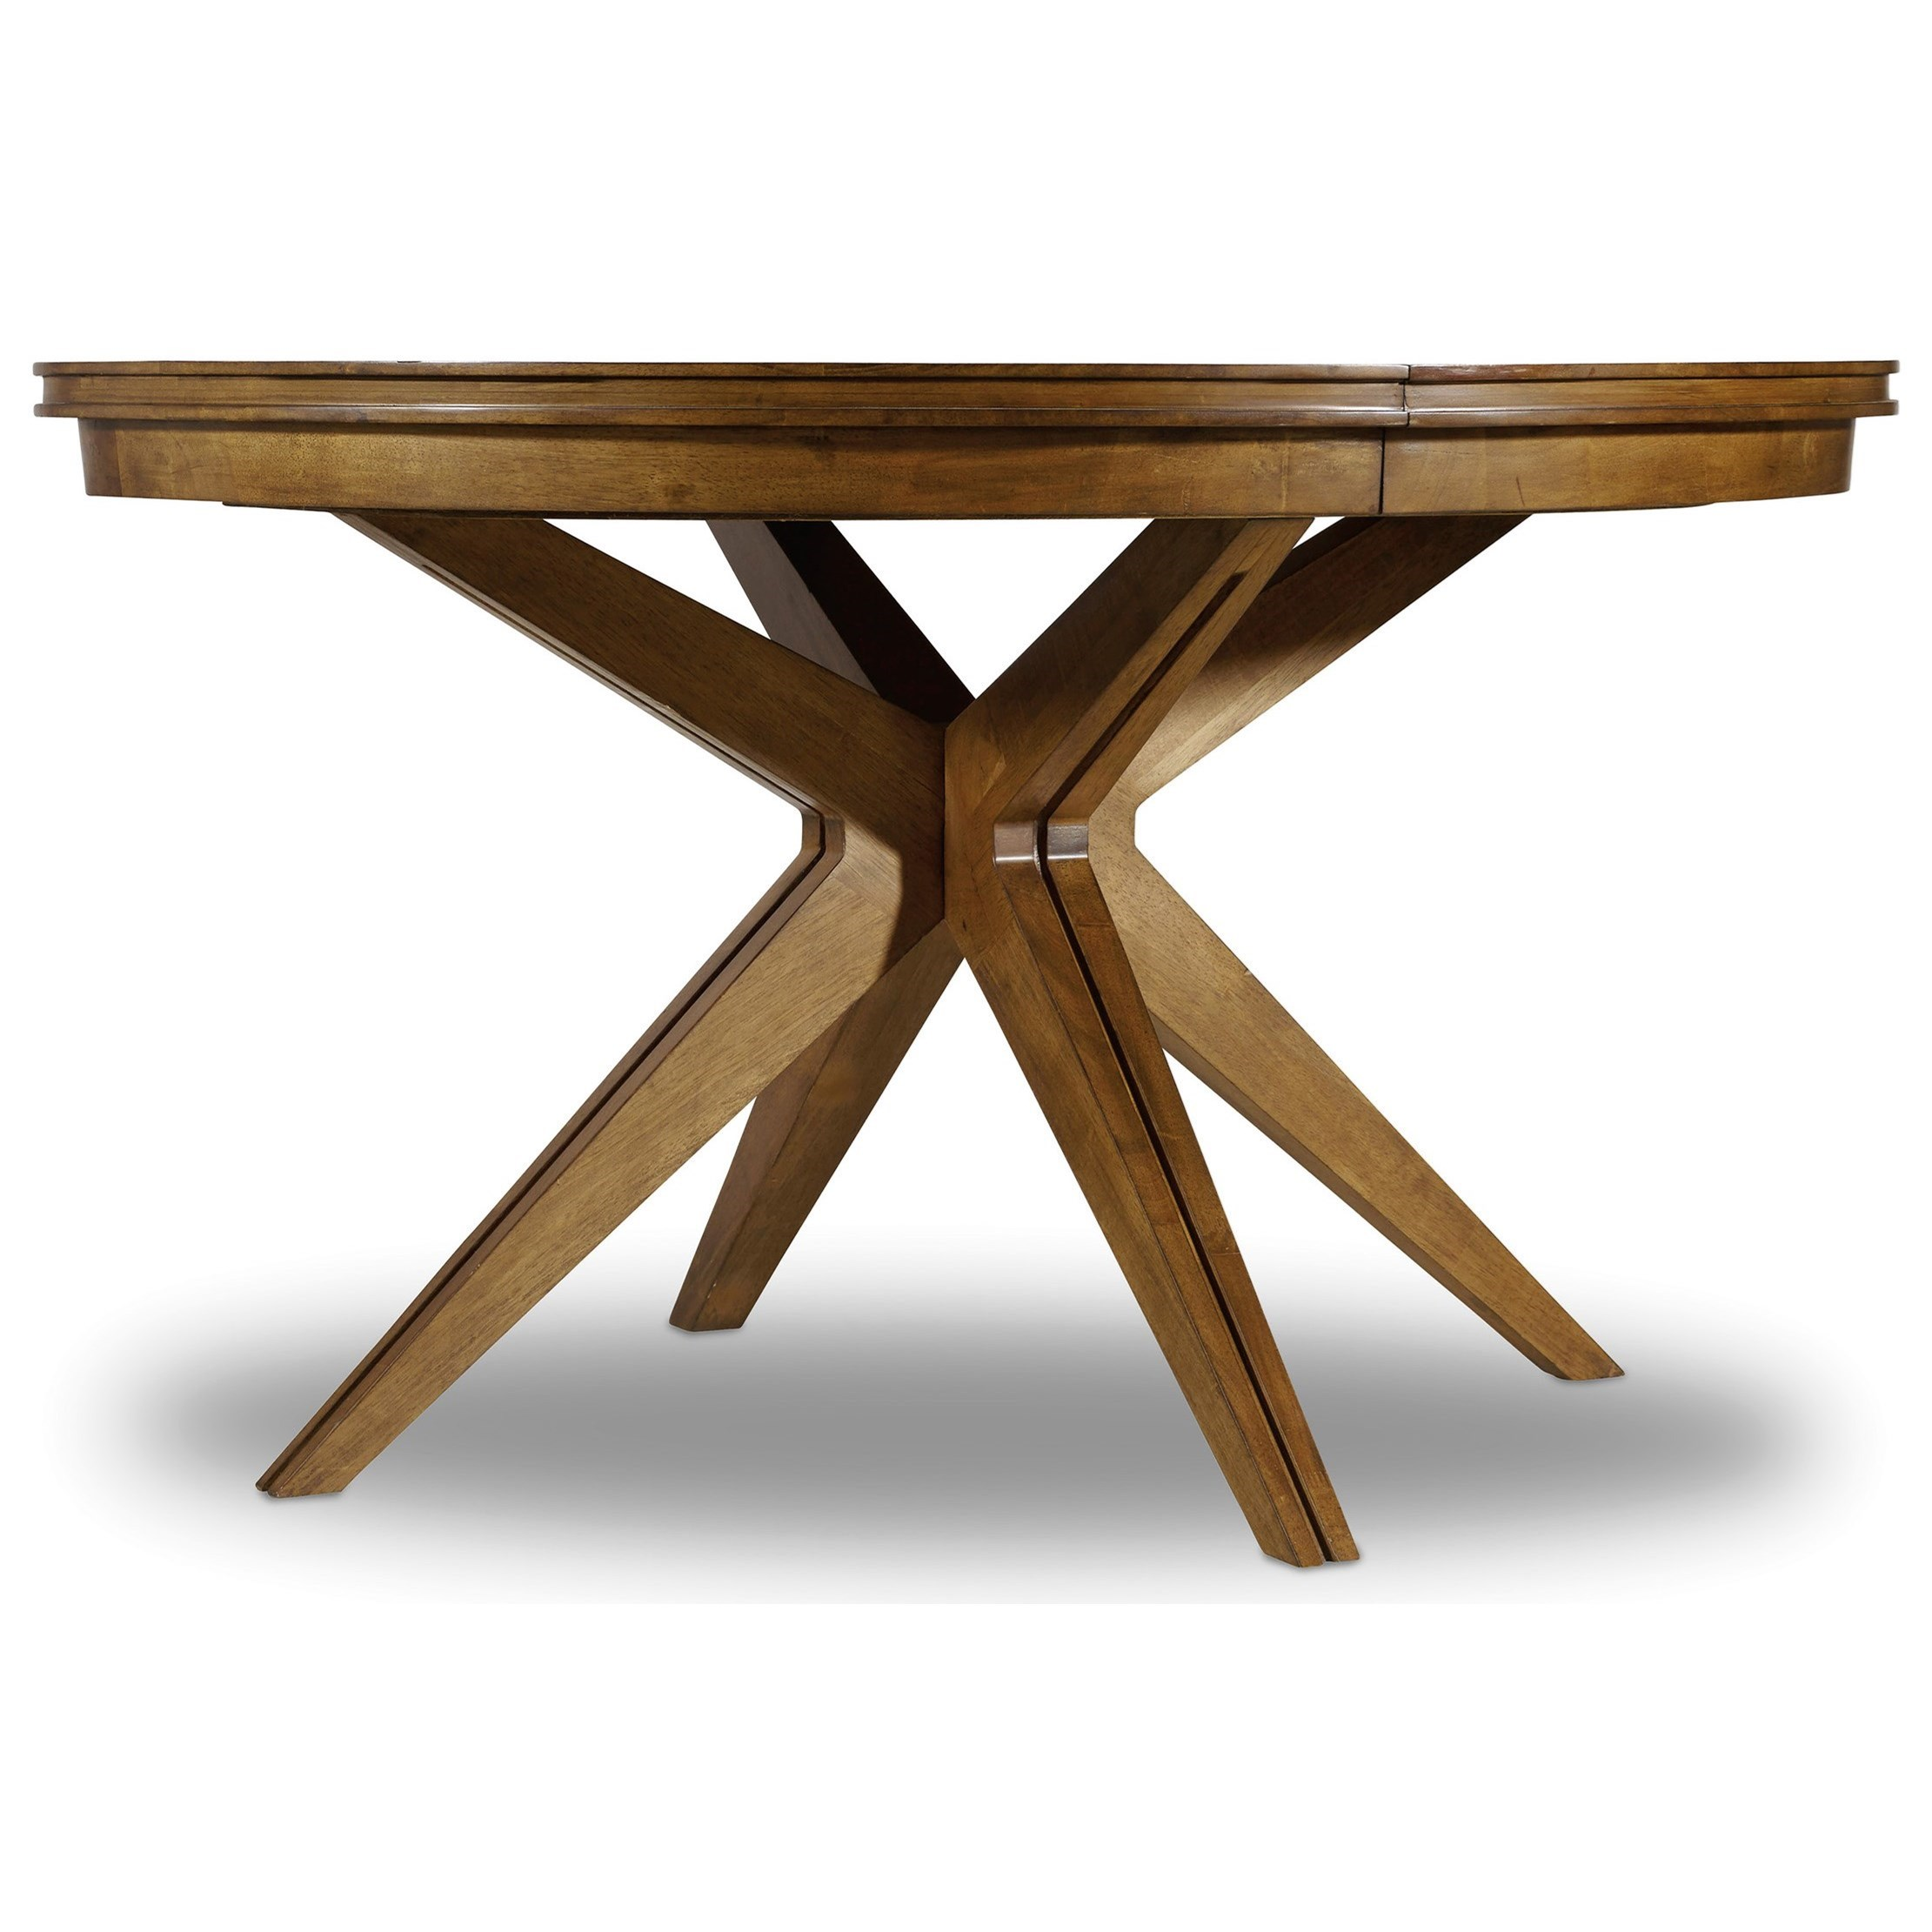 Hooker Furniture Retropolitan Round Dining Table - Item Number: 5510-75201-MWD